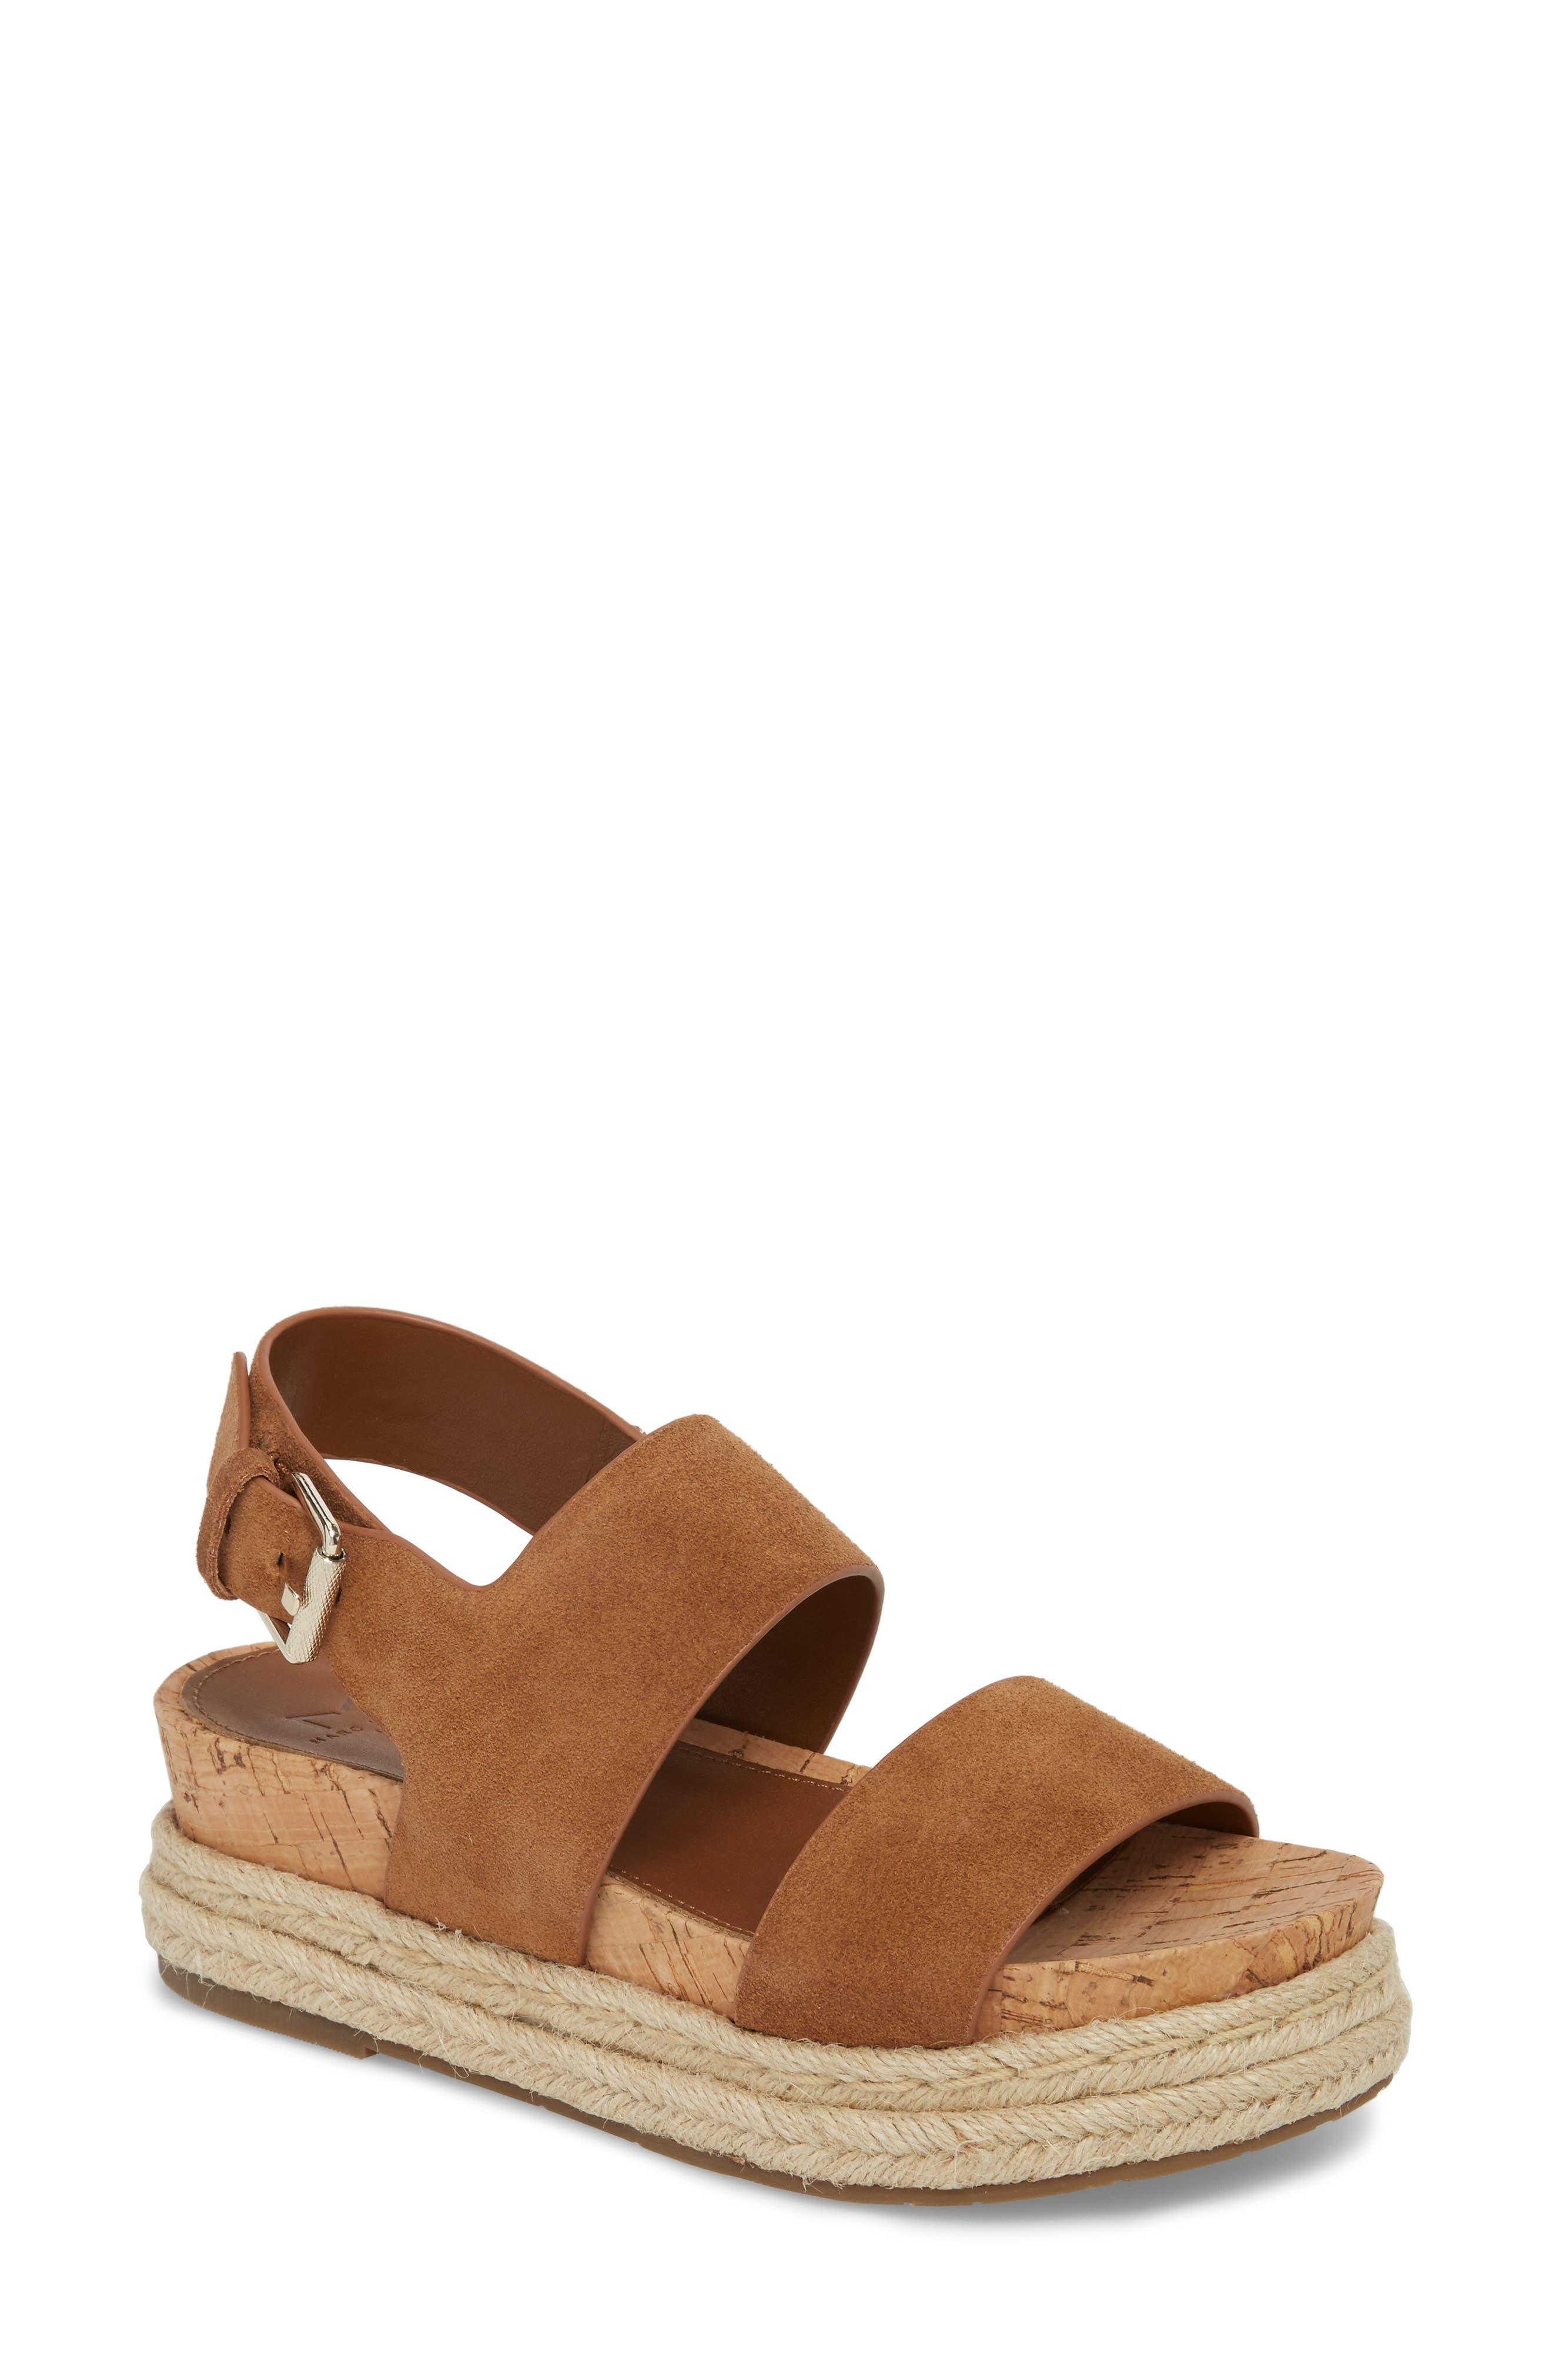 Oria Espadrille Platform Sandal,                         Main,                         color, COGNAC SUEDE